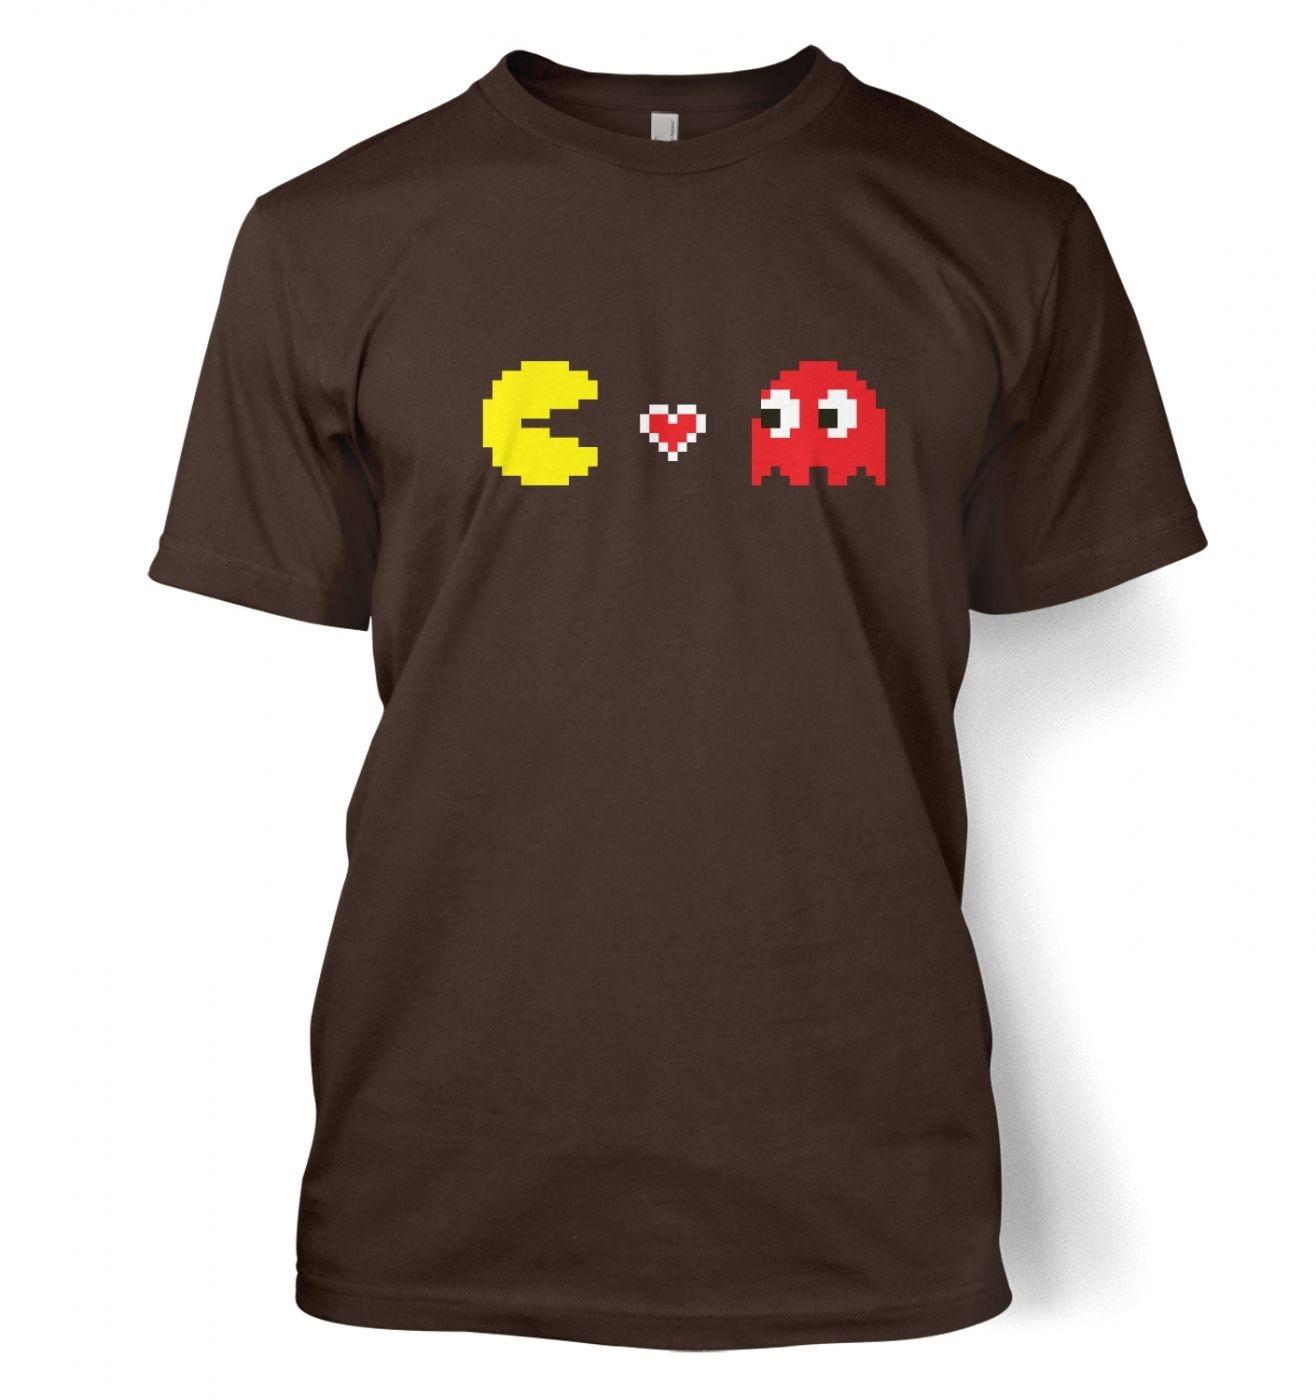 Squid Love Cheese men's t-shirt